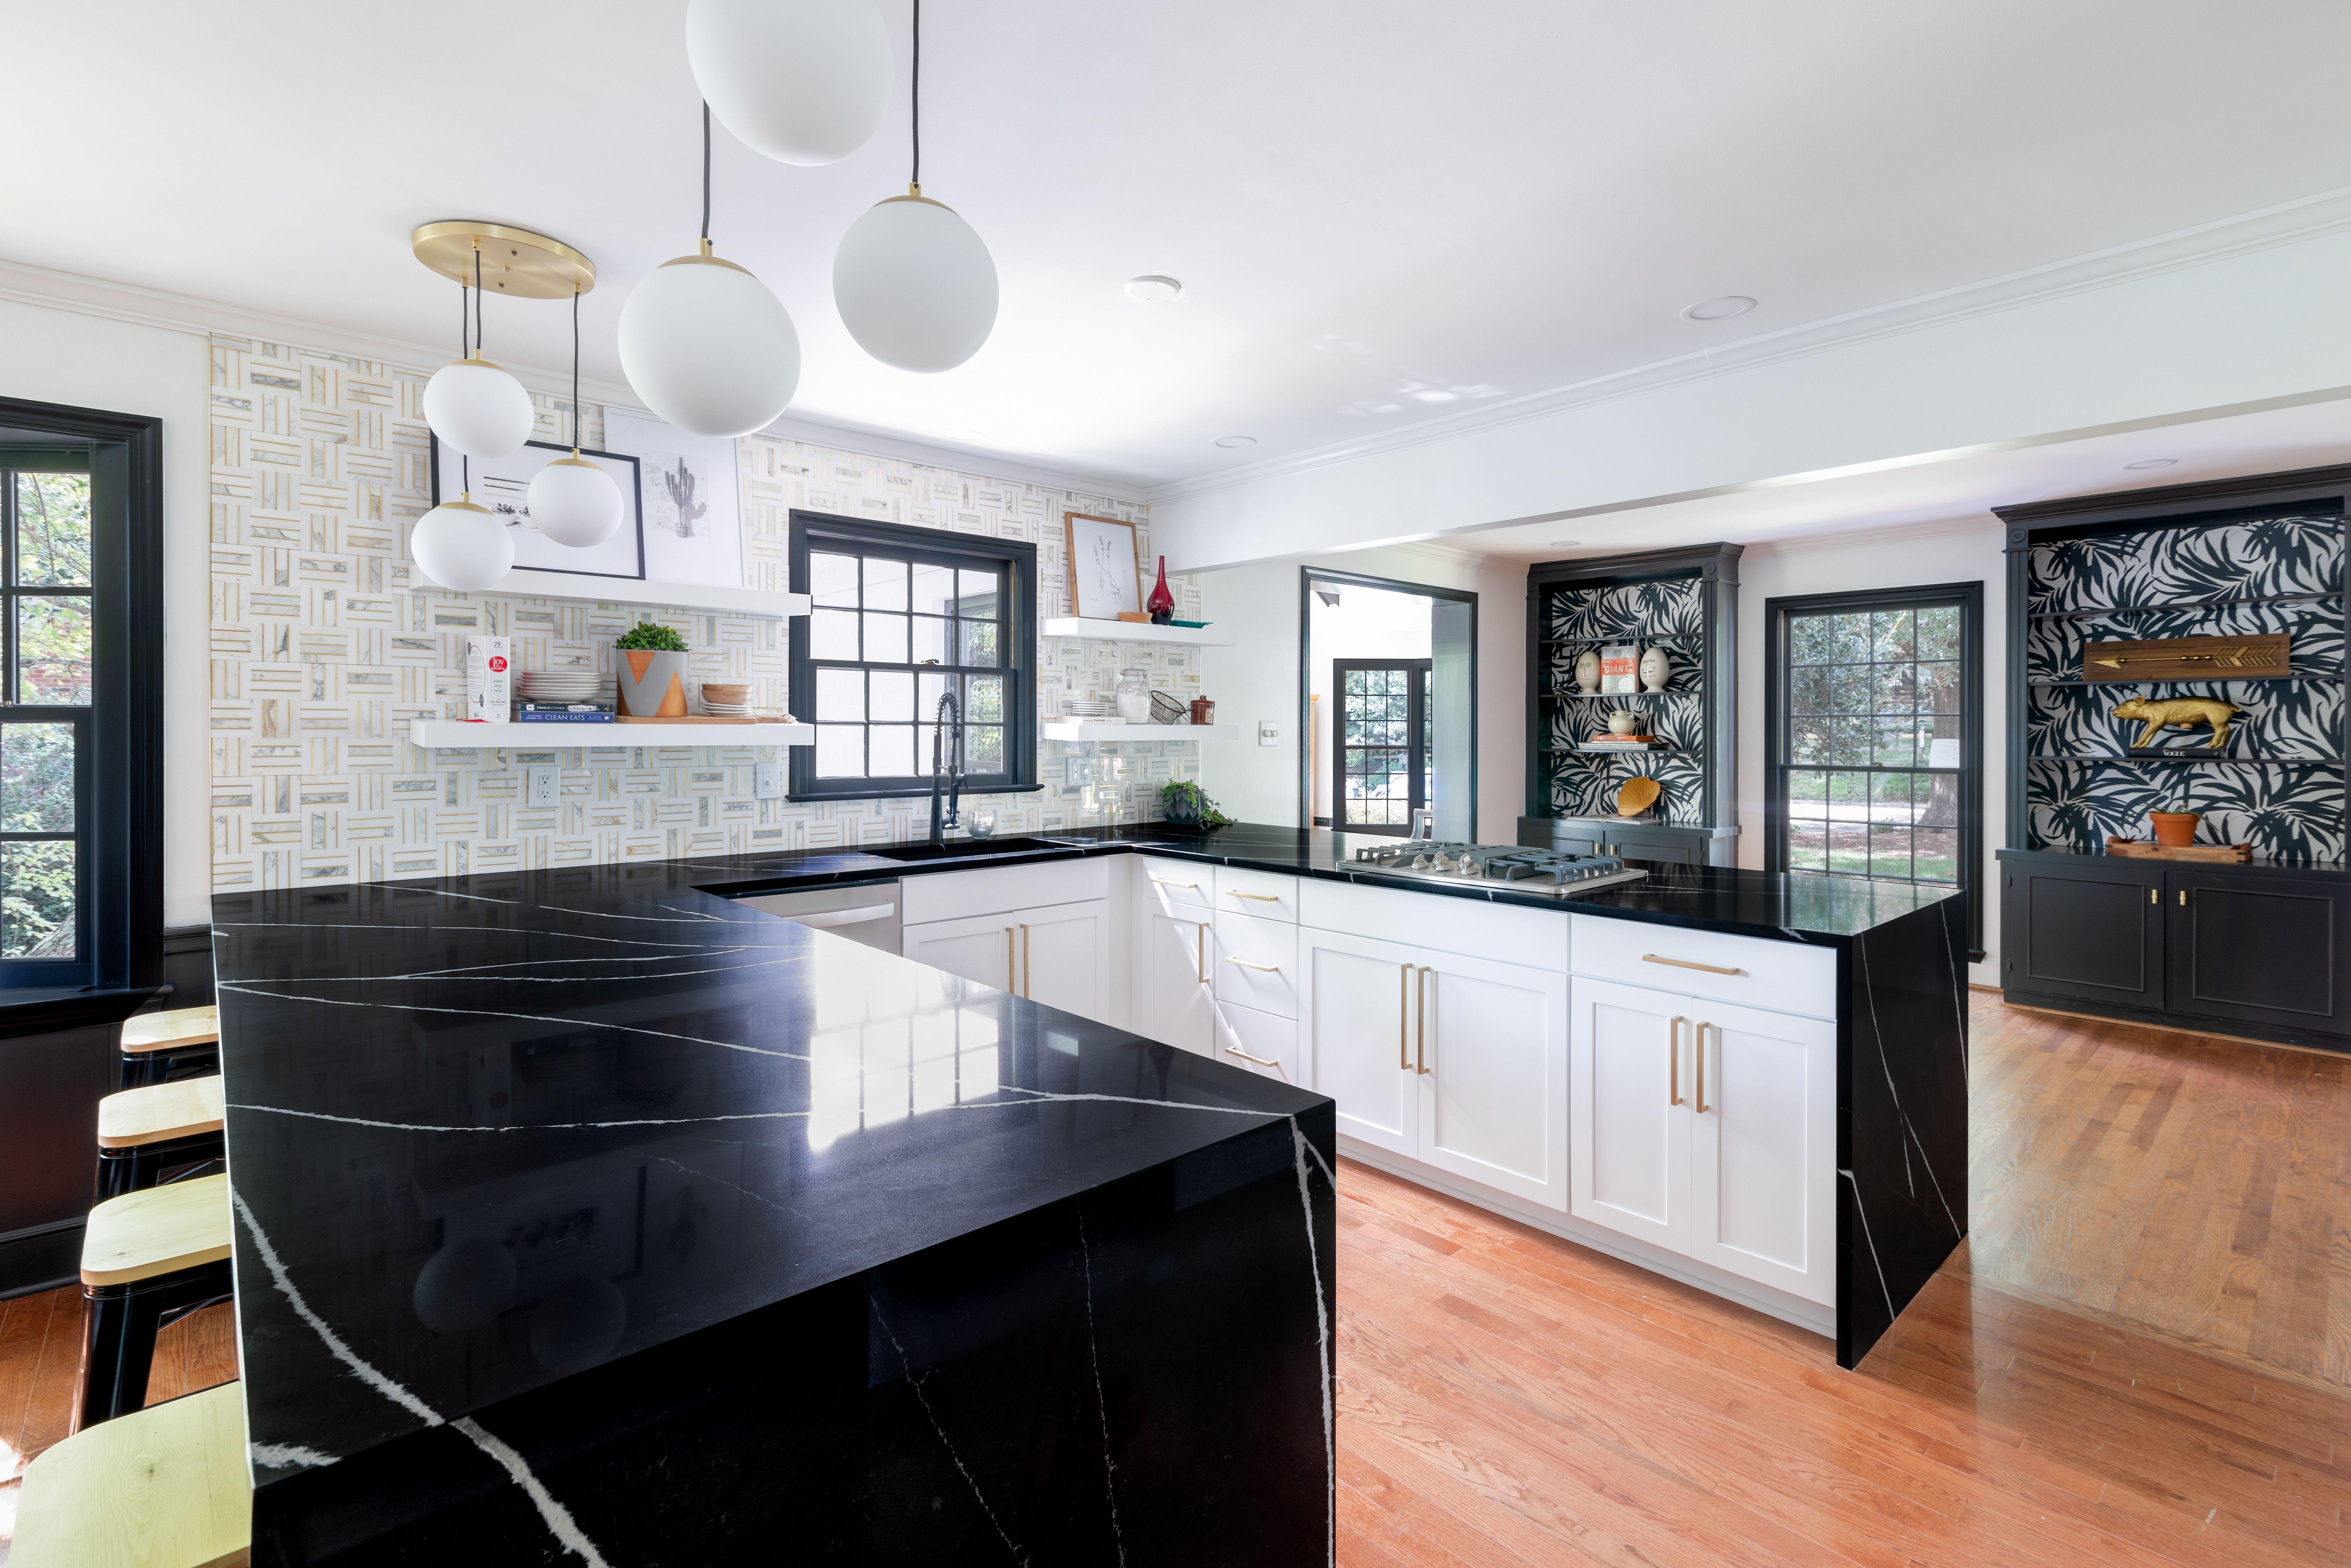 Modern Kitchen Remodel Using Eternal Marquina Silestone Quartz